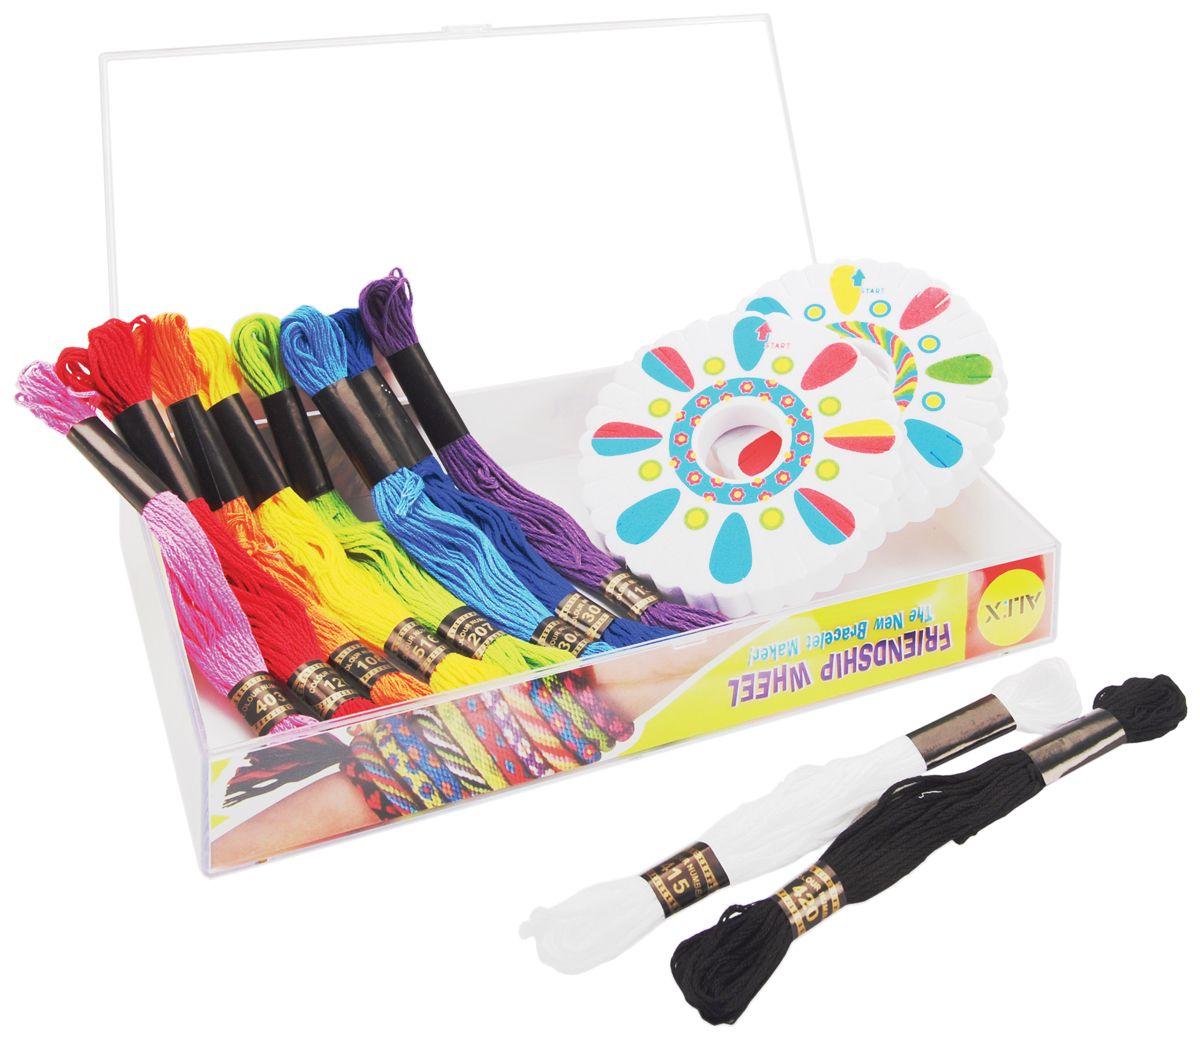 137w friendship wheel bracelet maker kit alex toys friendship wheel